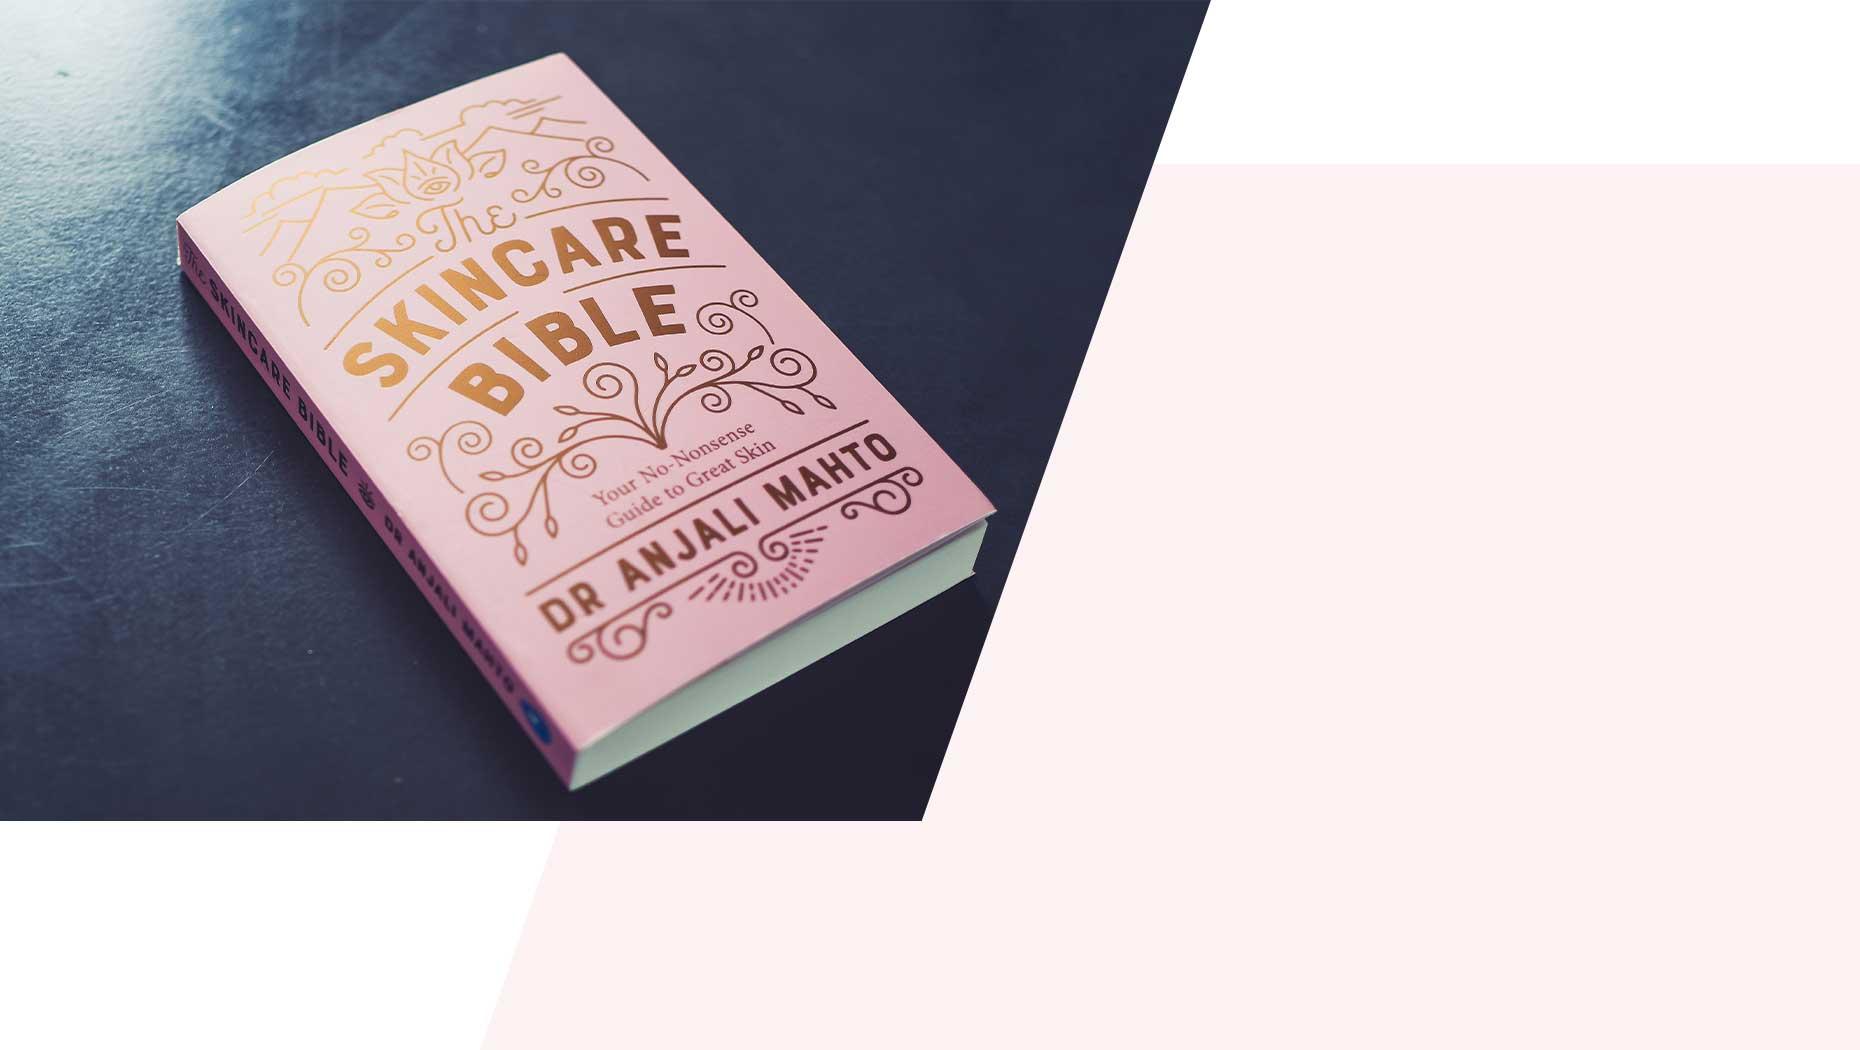 The skincare bible